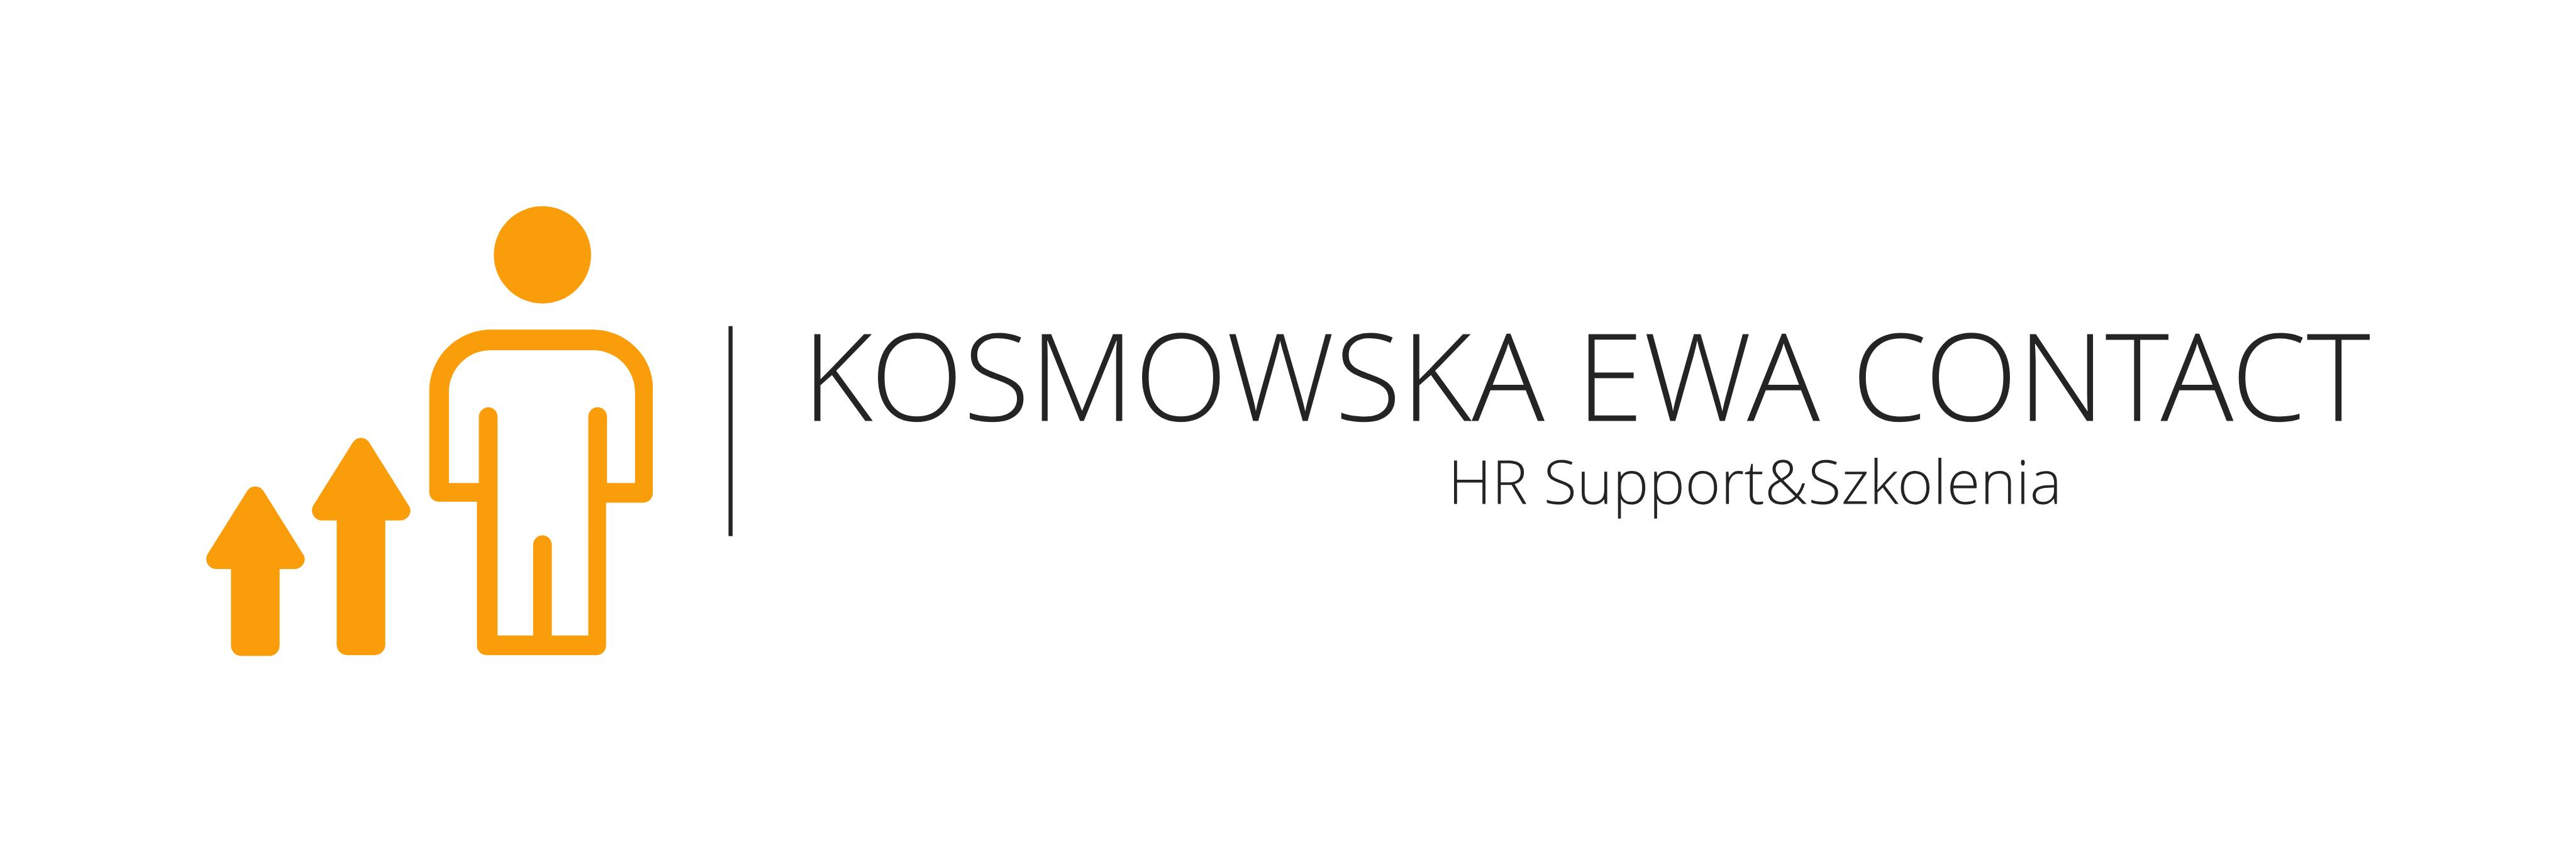 Logo KOSMOWSKA EWA CONTACT